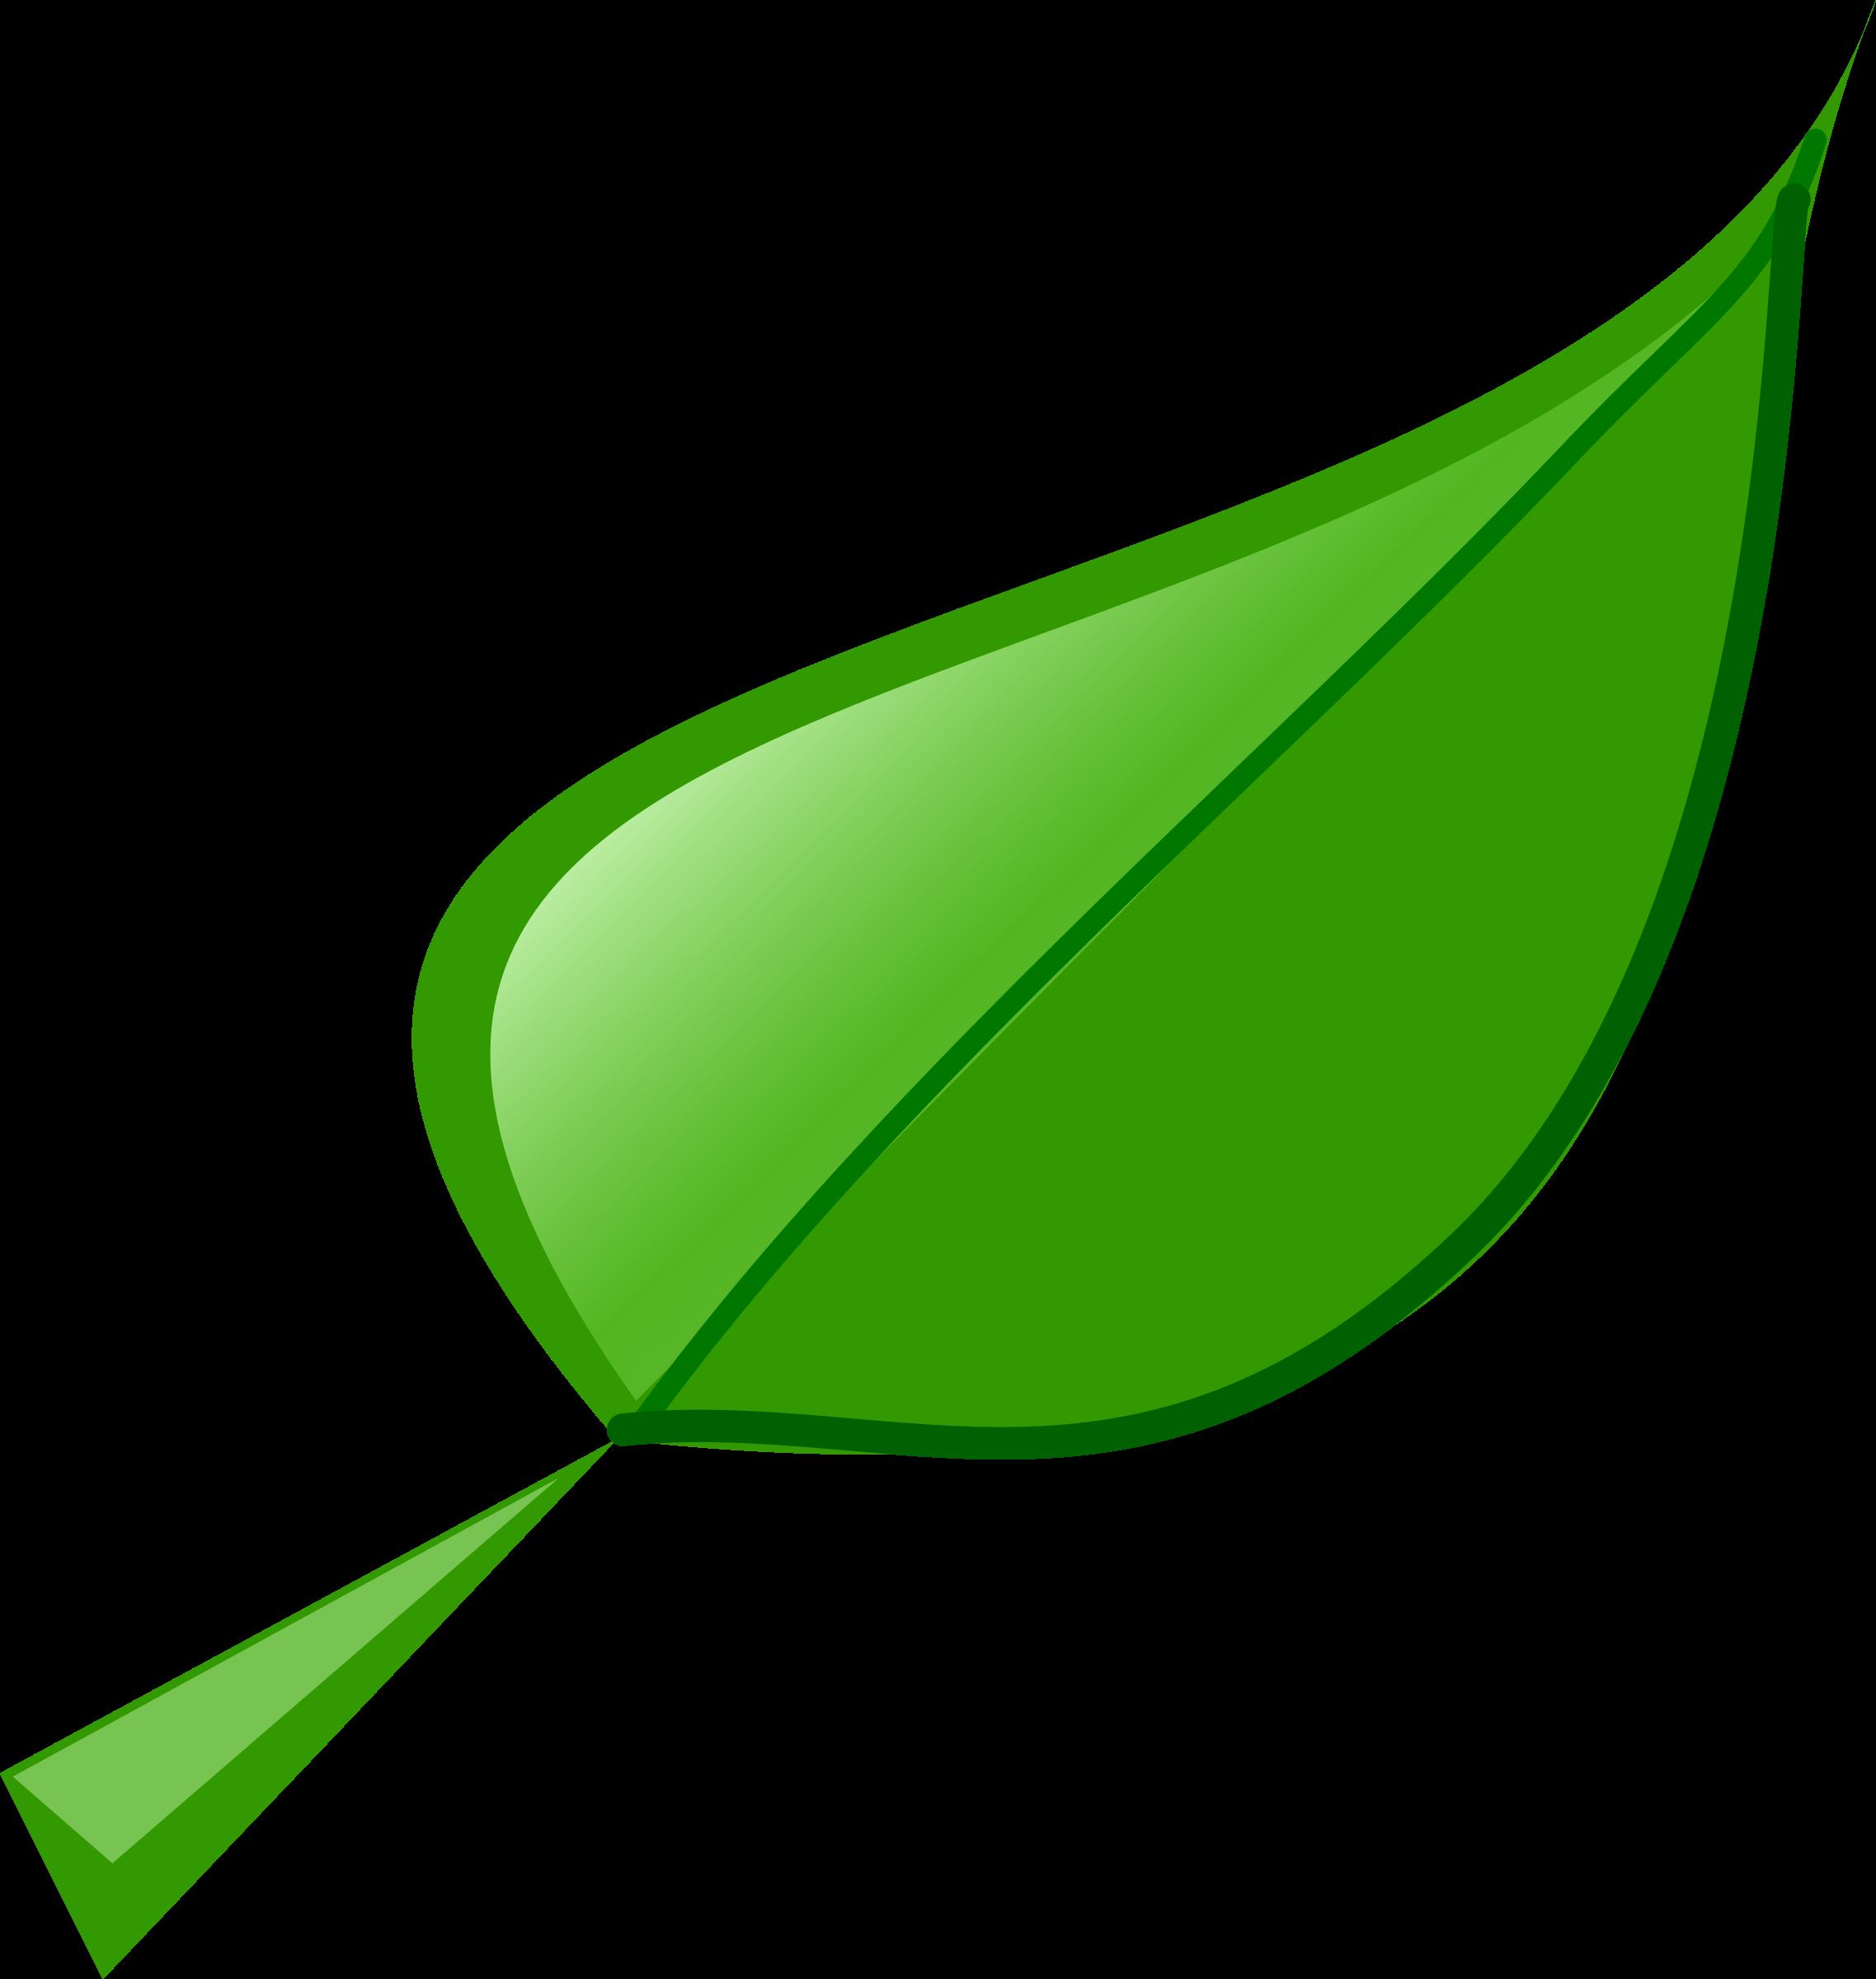 Clipart leaf - Plantas de hojas verdes ...